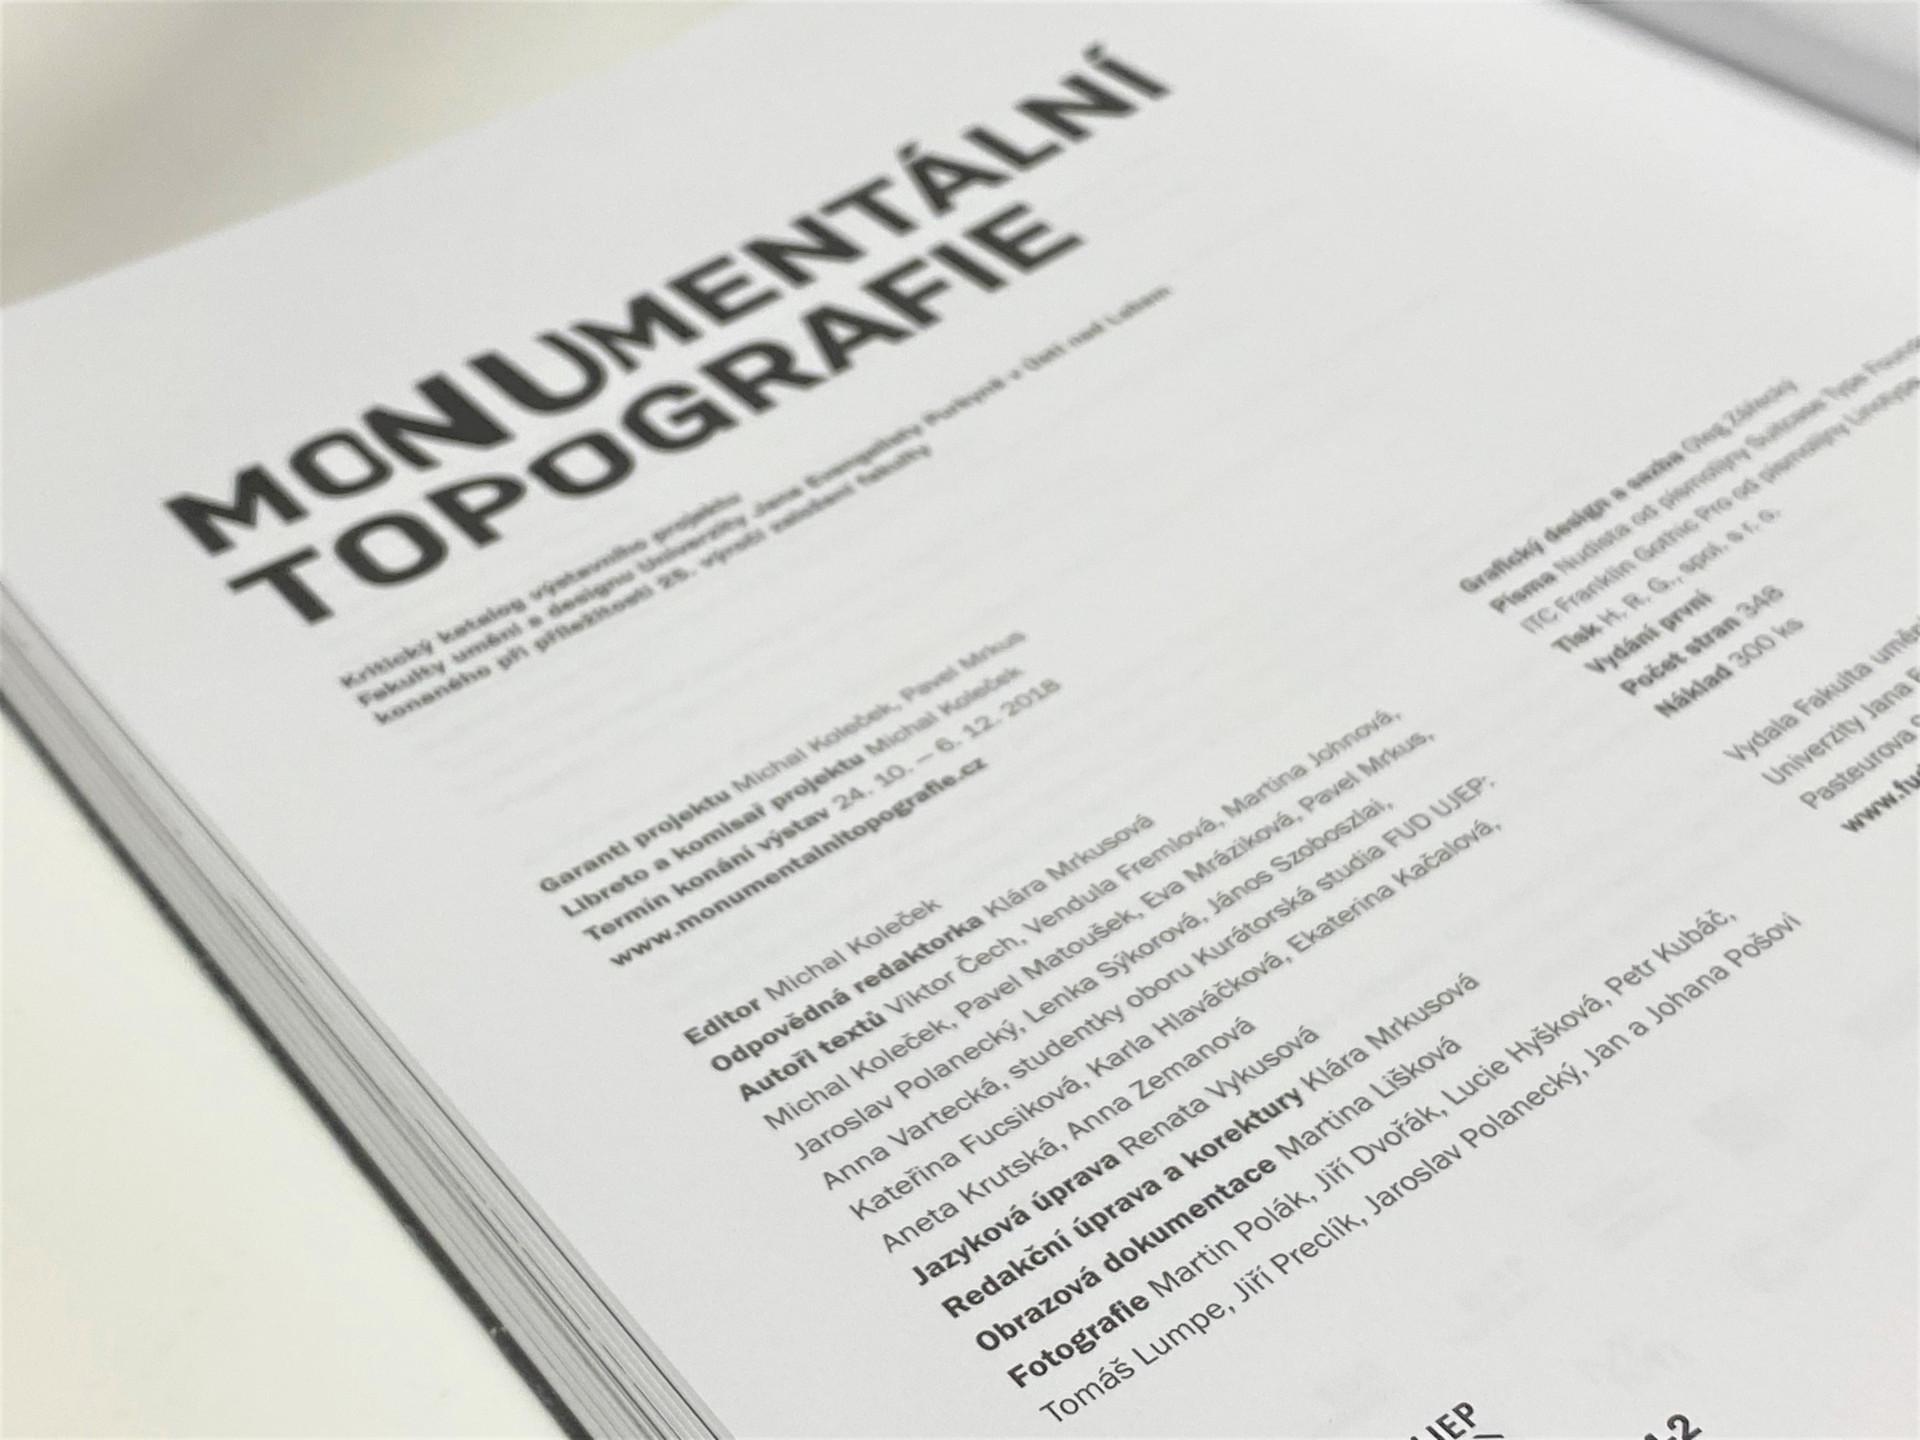 Mo-nu-mentalní topografie_kriticky_katalog-tiraz_Klara-Mrkusova